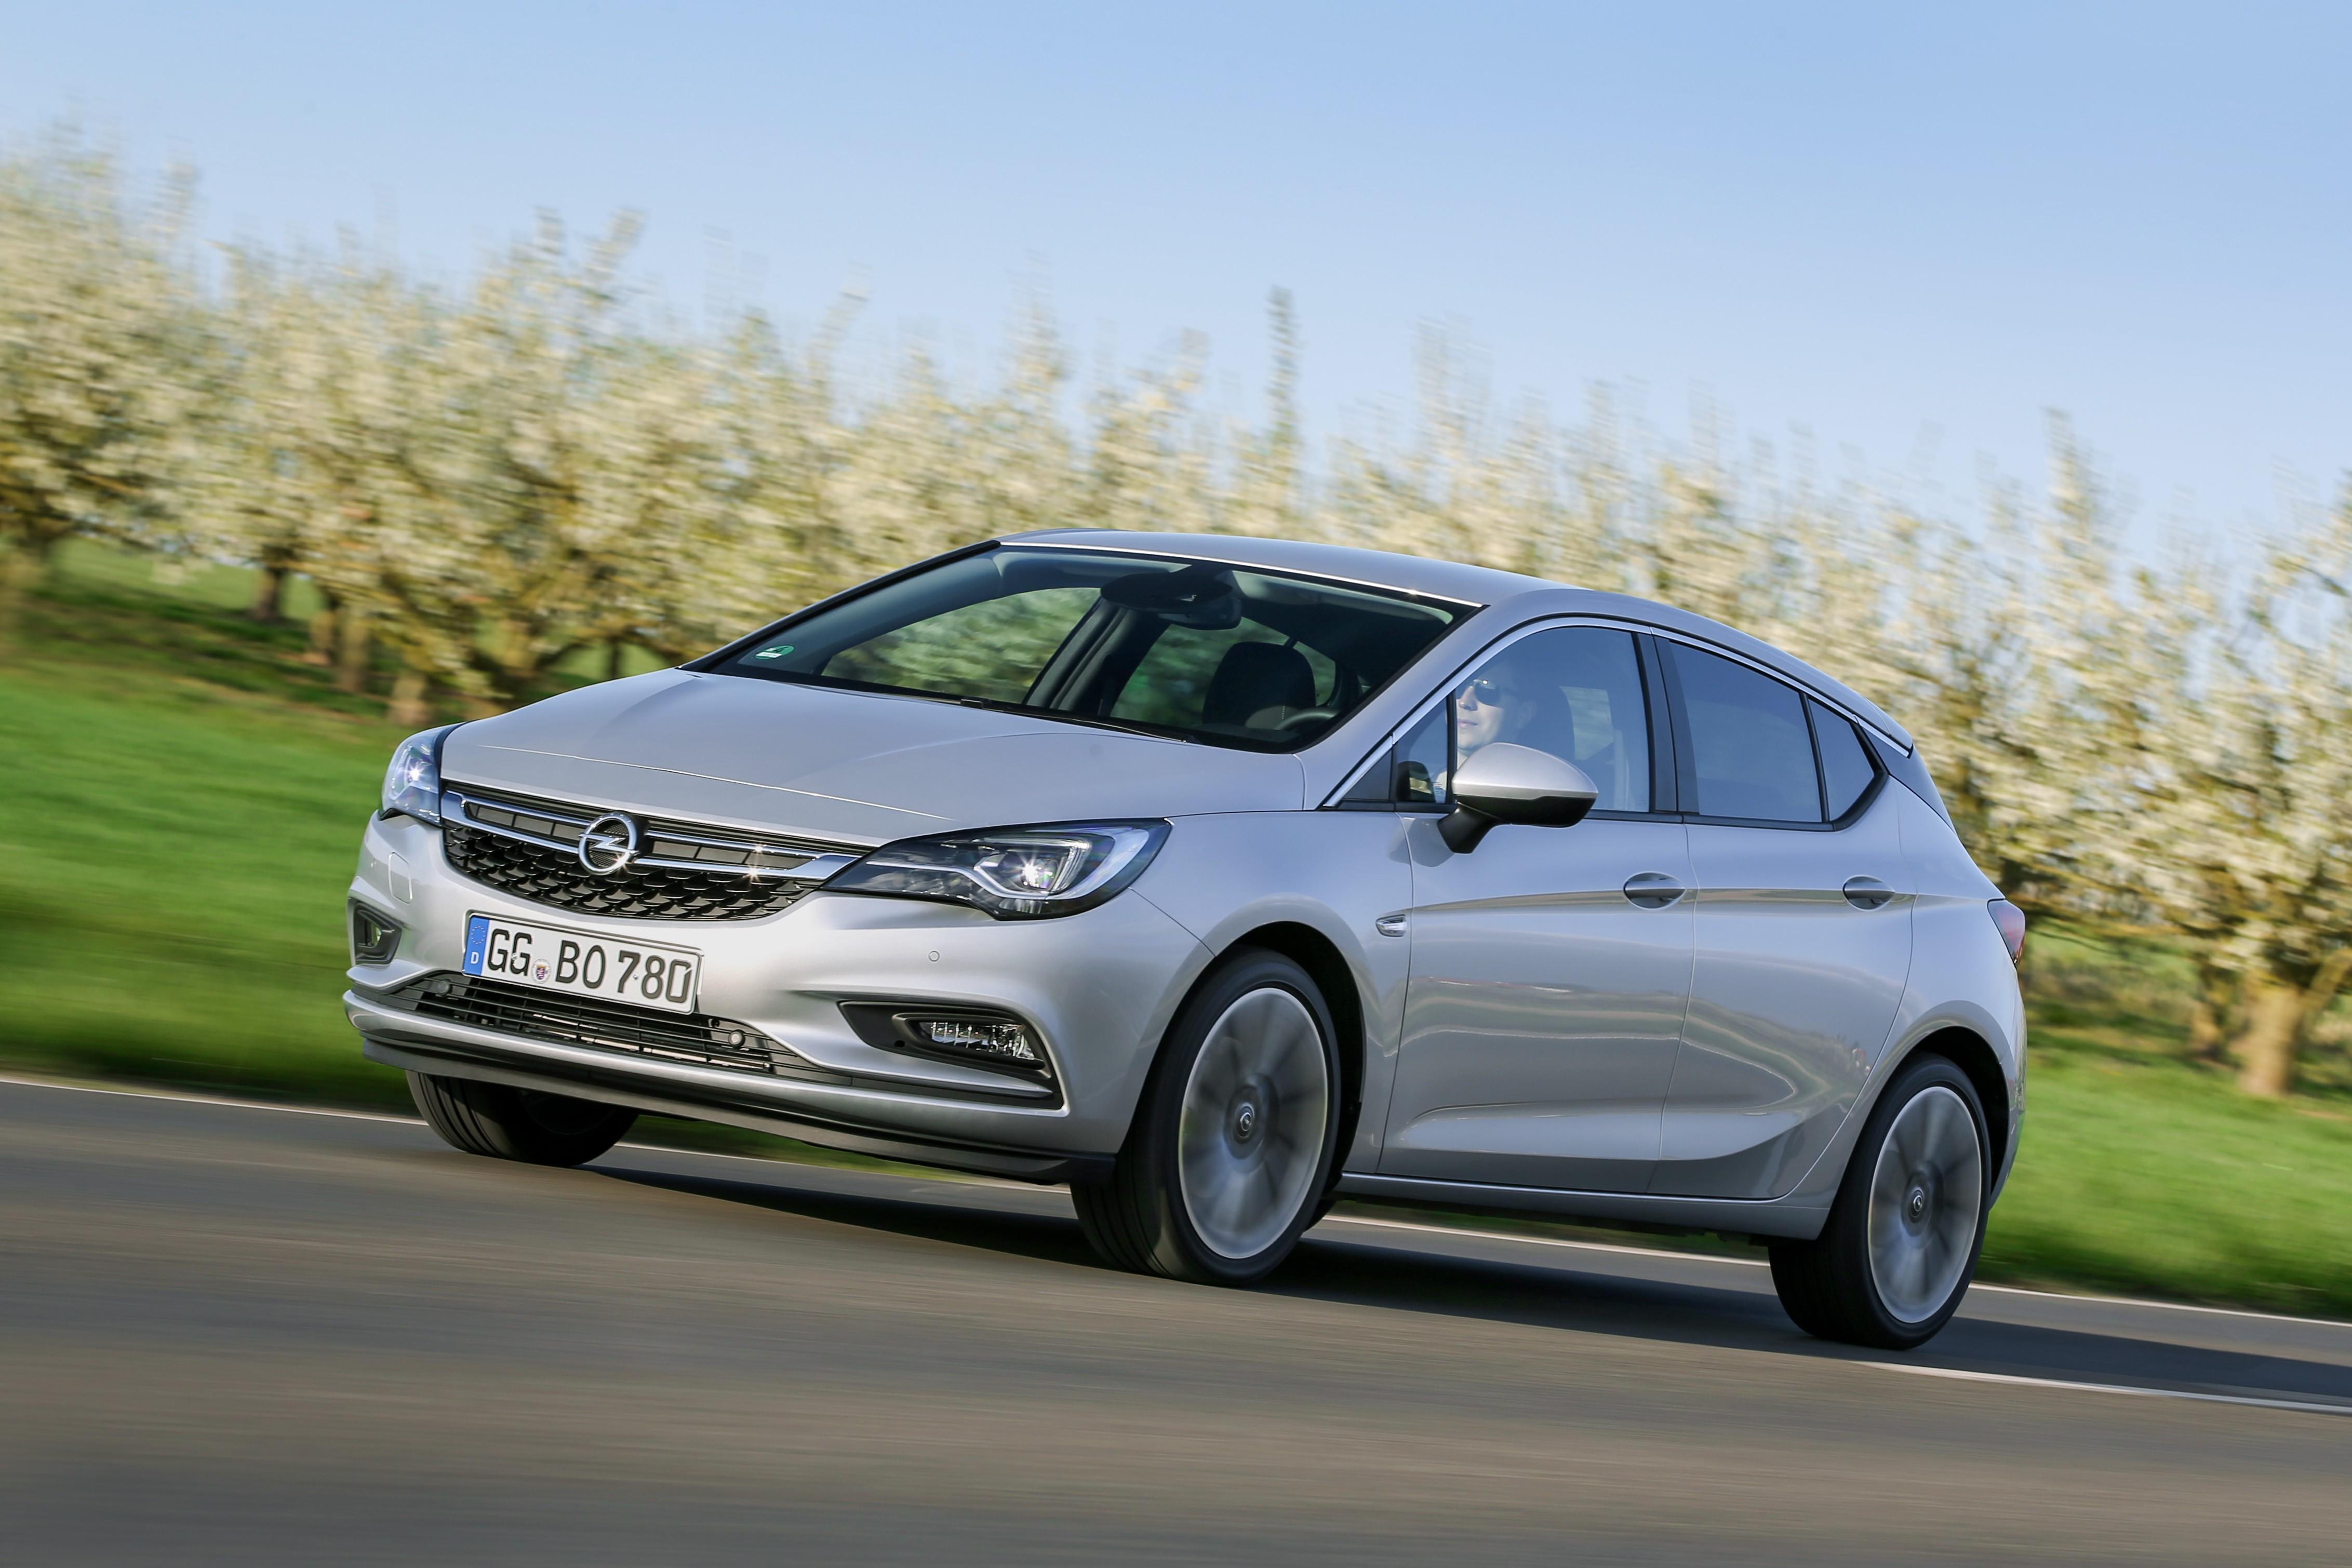 2016 Opel Astra BiTurbo CDTI Priced at €27,310 - autoevolution